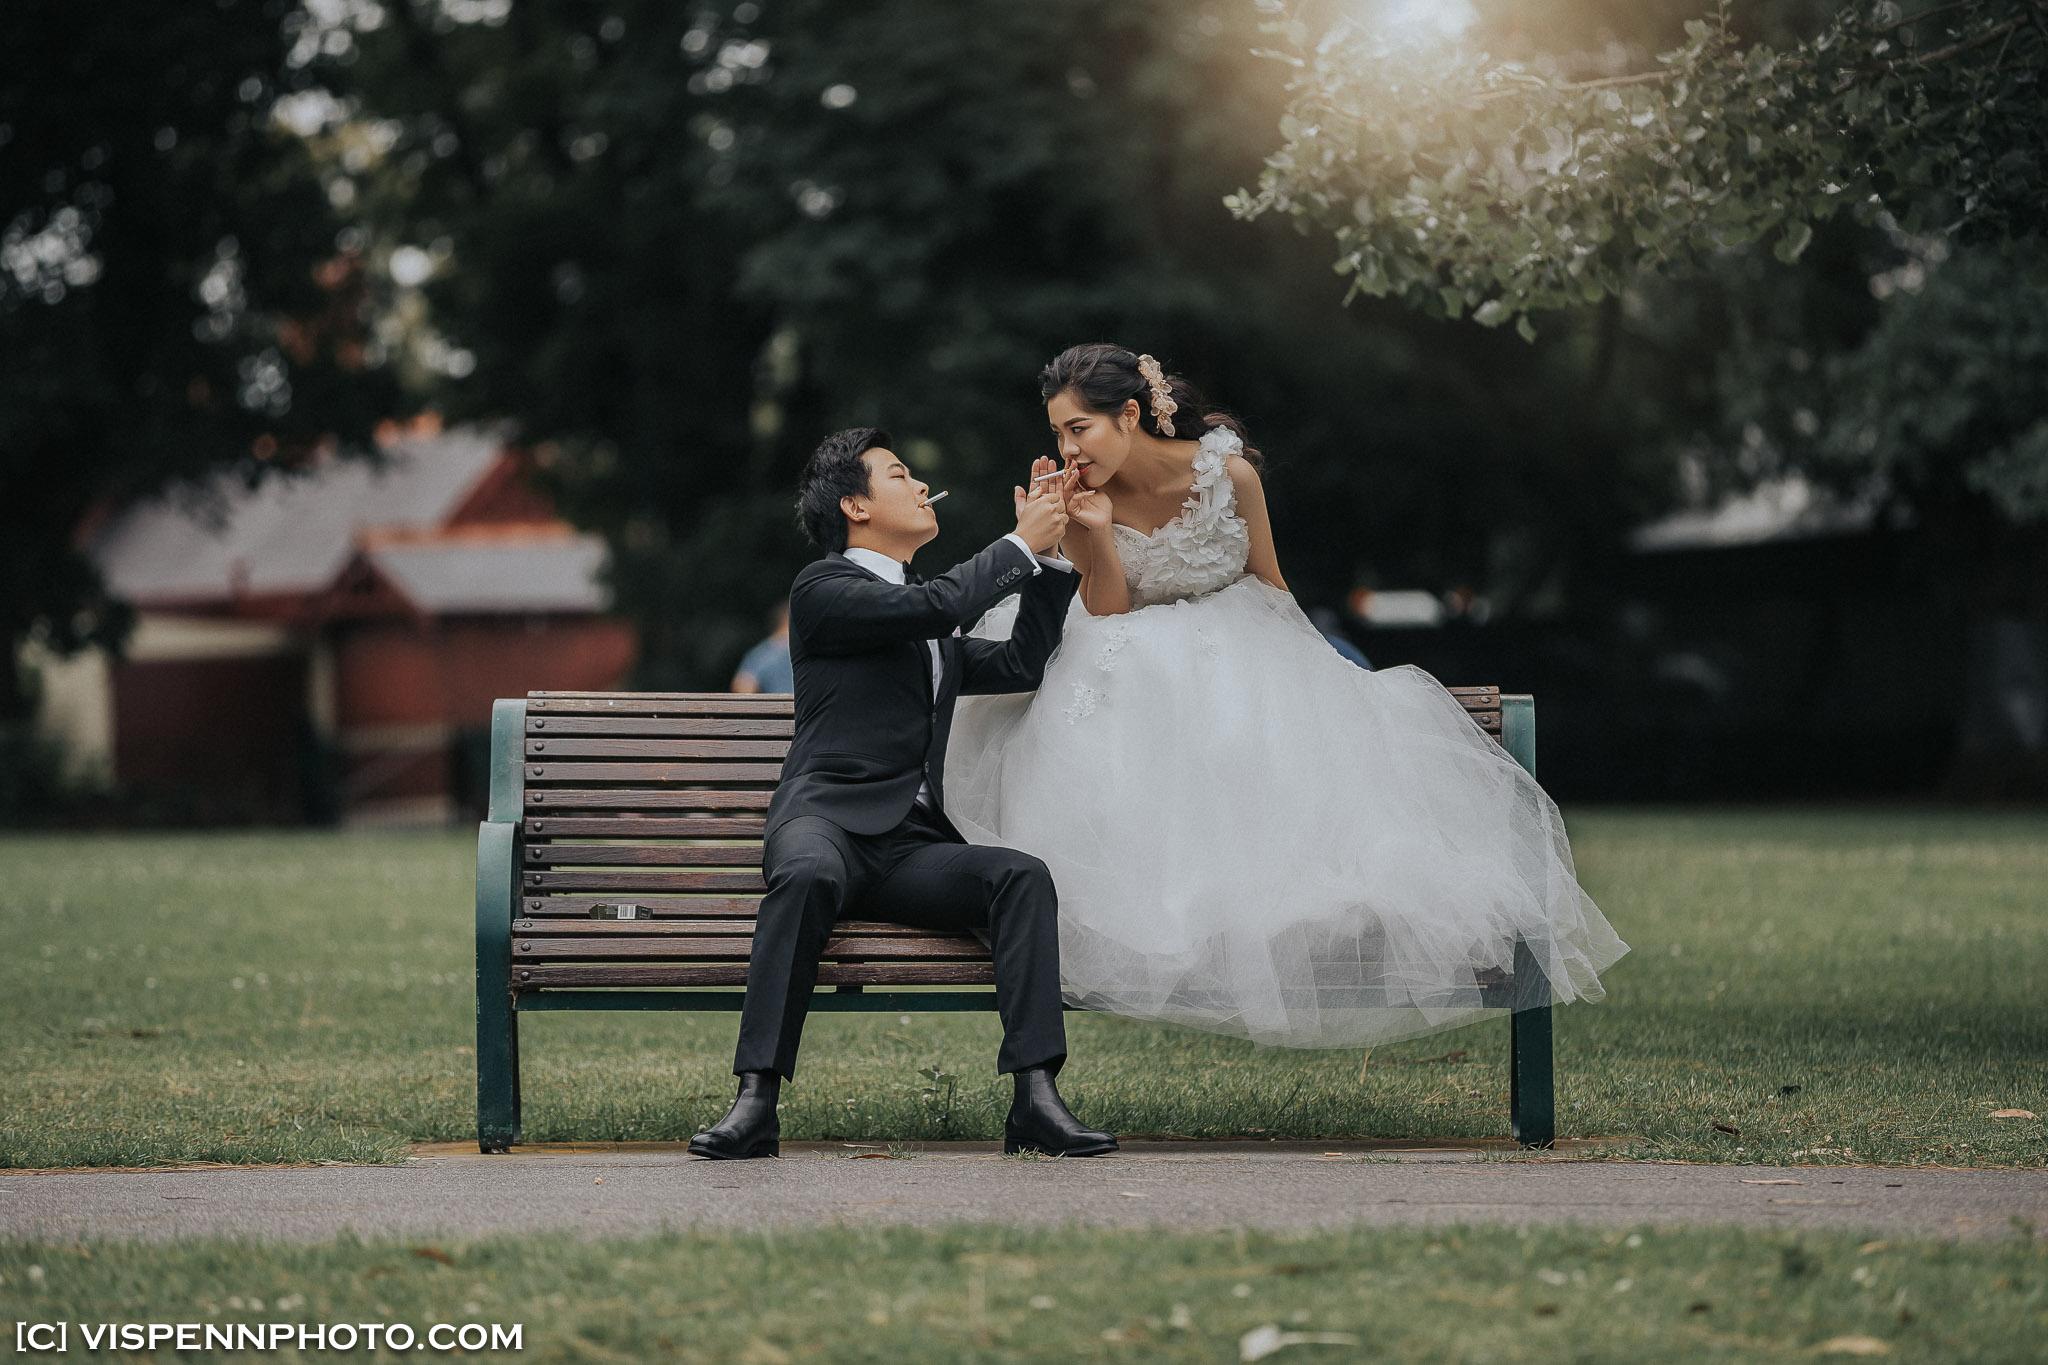 PRE WEDDING Photography Melbourne VISPENN 墨尔本 婚纱照 结婚照 婚纱摄影 1DX 0472